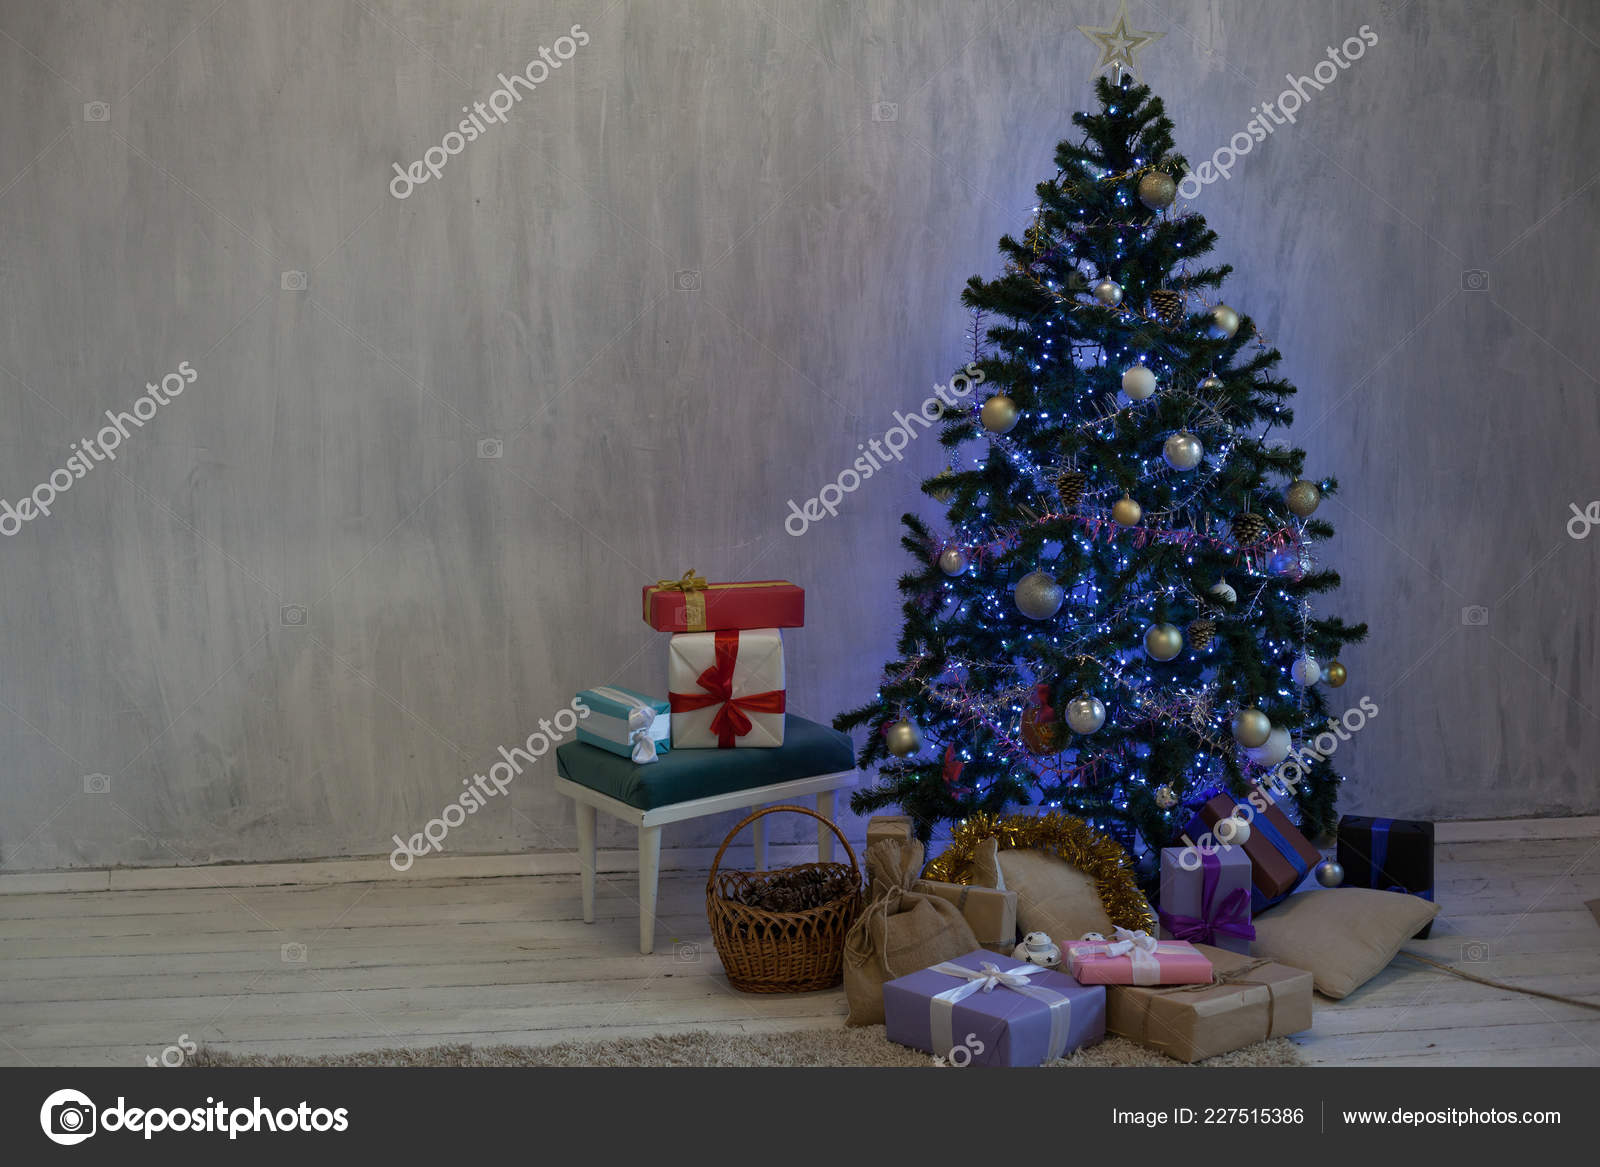 Holiday Christmas Interior home Christmas tree and gifts new year ...